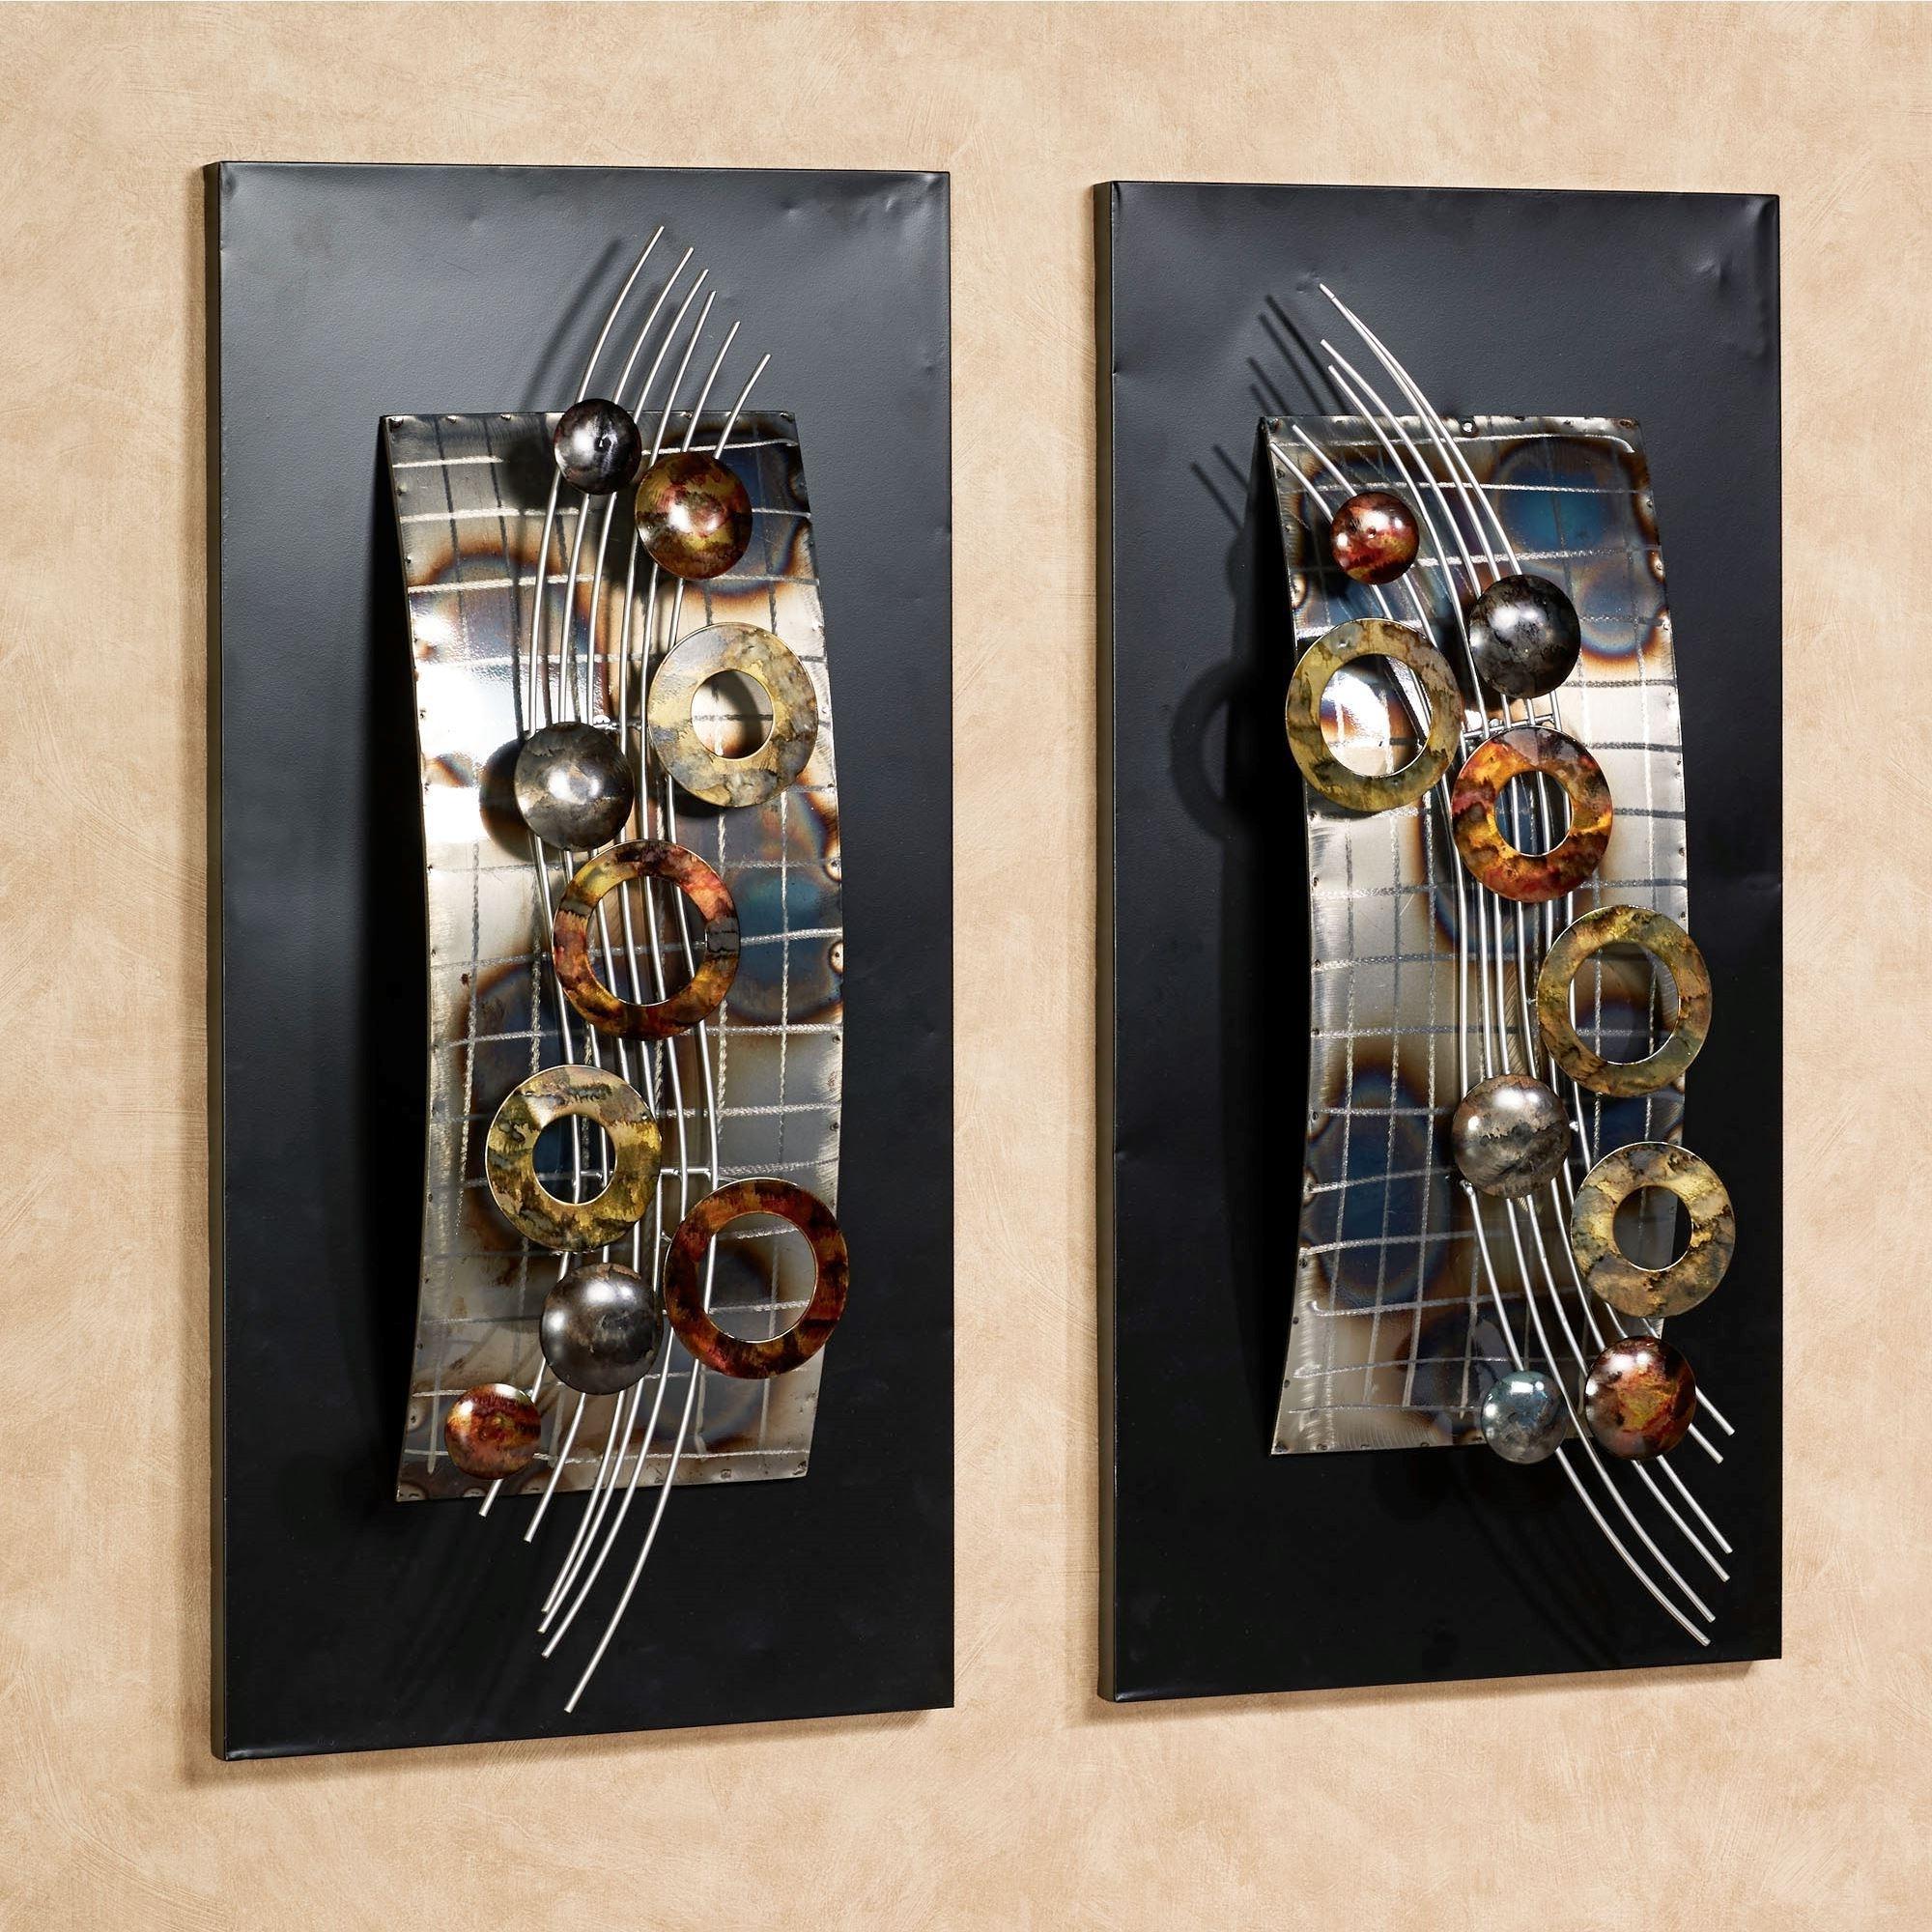 Metal Wall Art Panels – Outdoor Metal Wall Art Panels Outdoor With Regard To Widely Used Wall Art Panels (View 7 of 15)